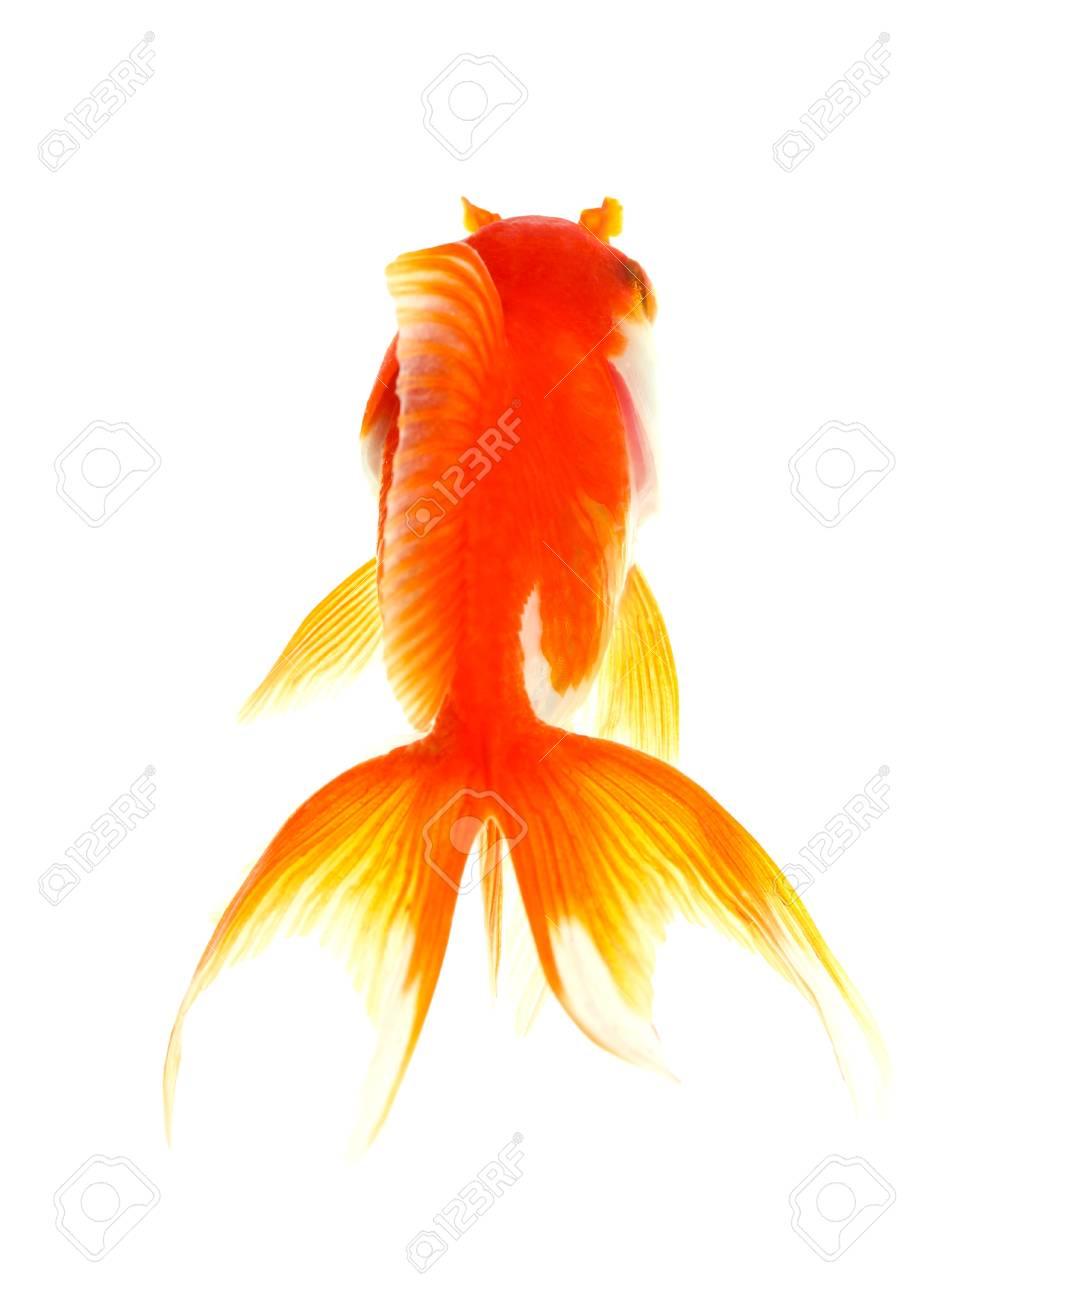 Gold fish  Isolation  on the white Stock Photo - 17422034